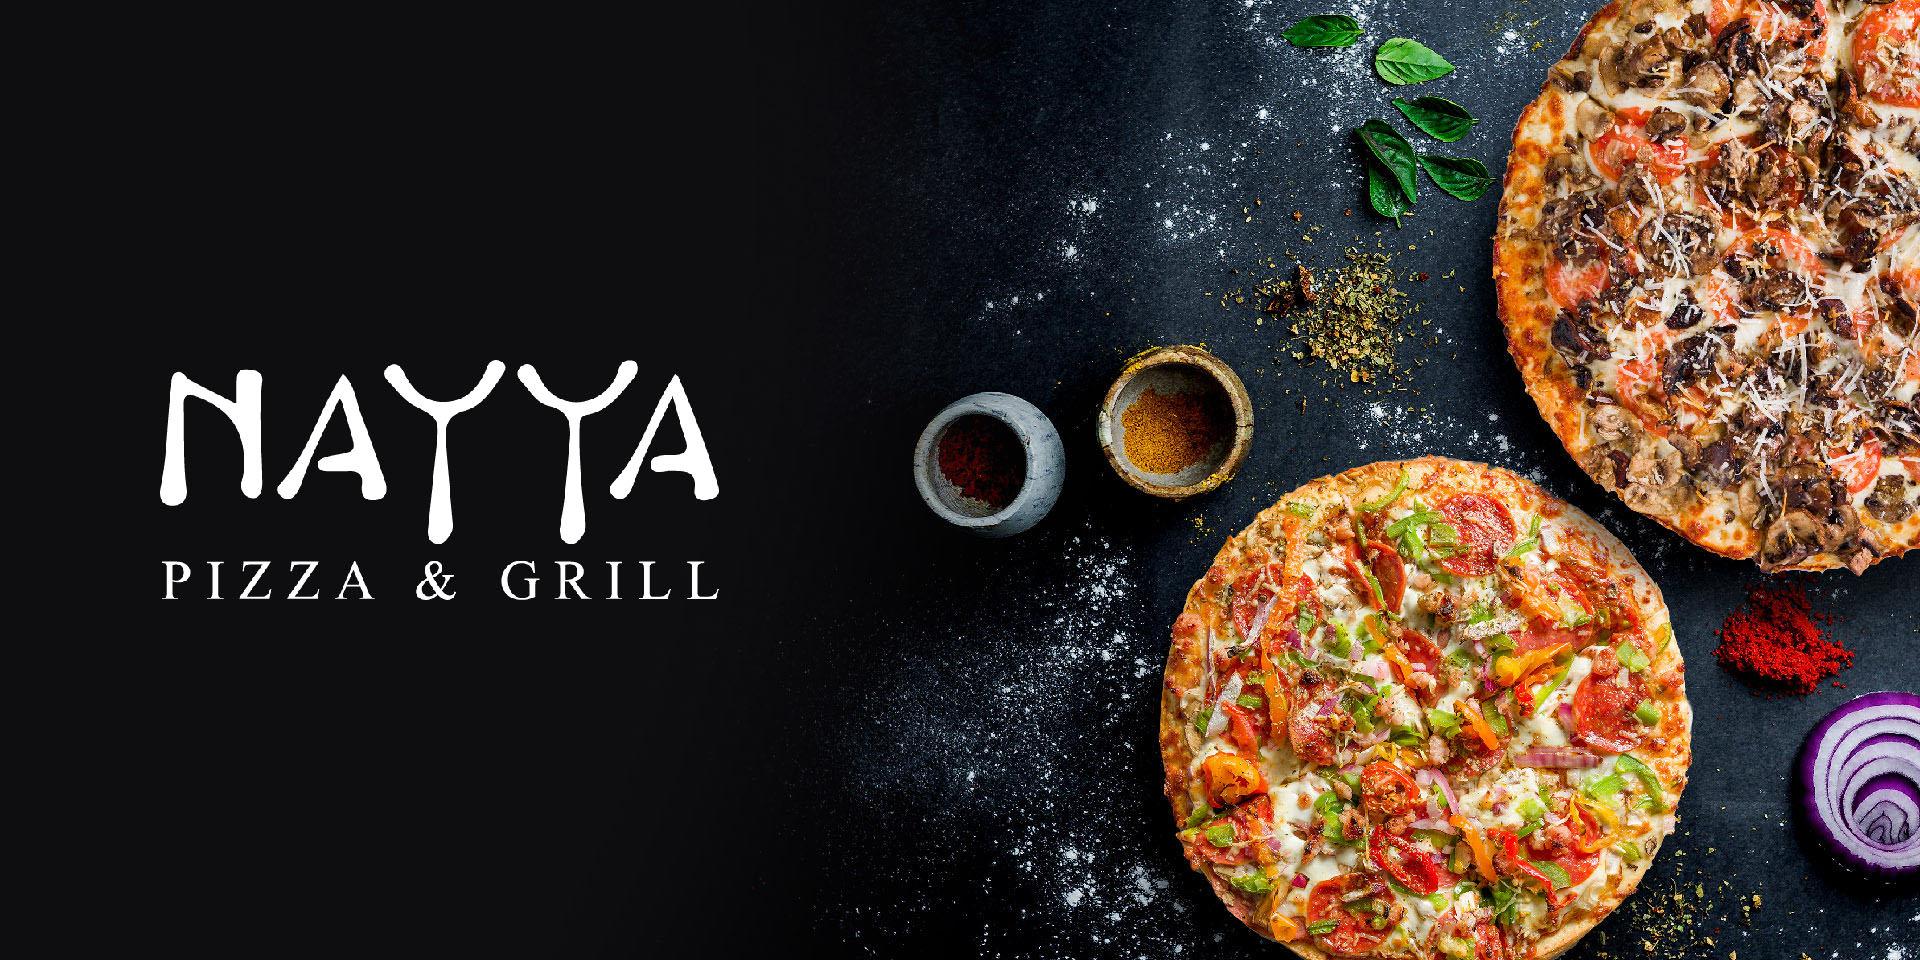 About Nayya Pizza & Grill